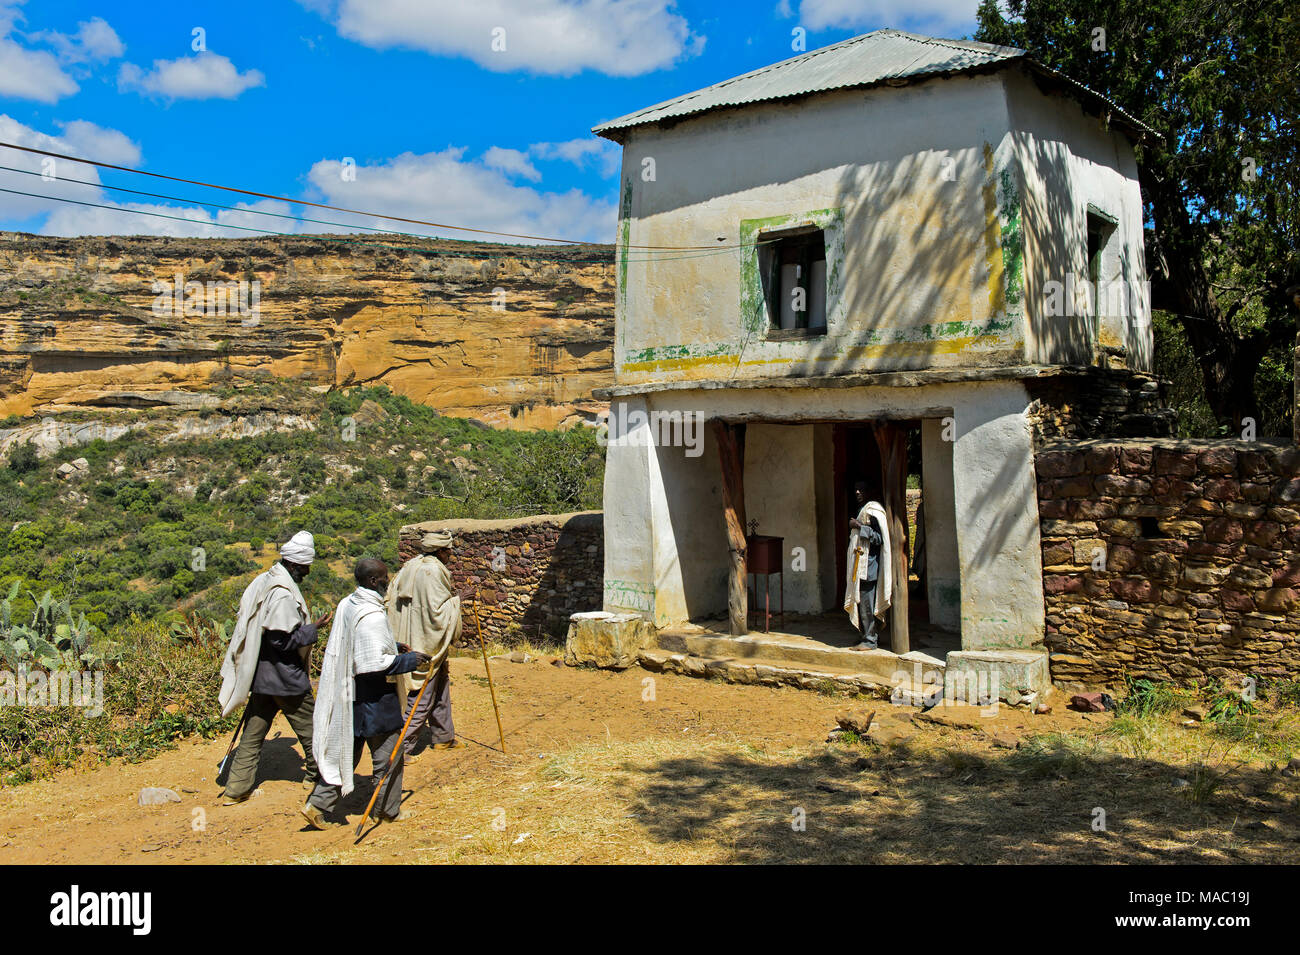 Pilgrims at the gate to the orthodox rock-hewn church Medhane Alem Kesho, Tigray region, Ethiopia - Stock Image